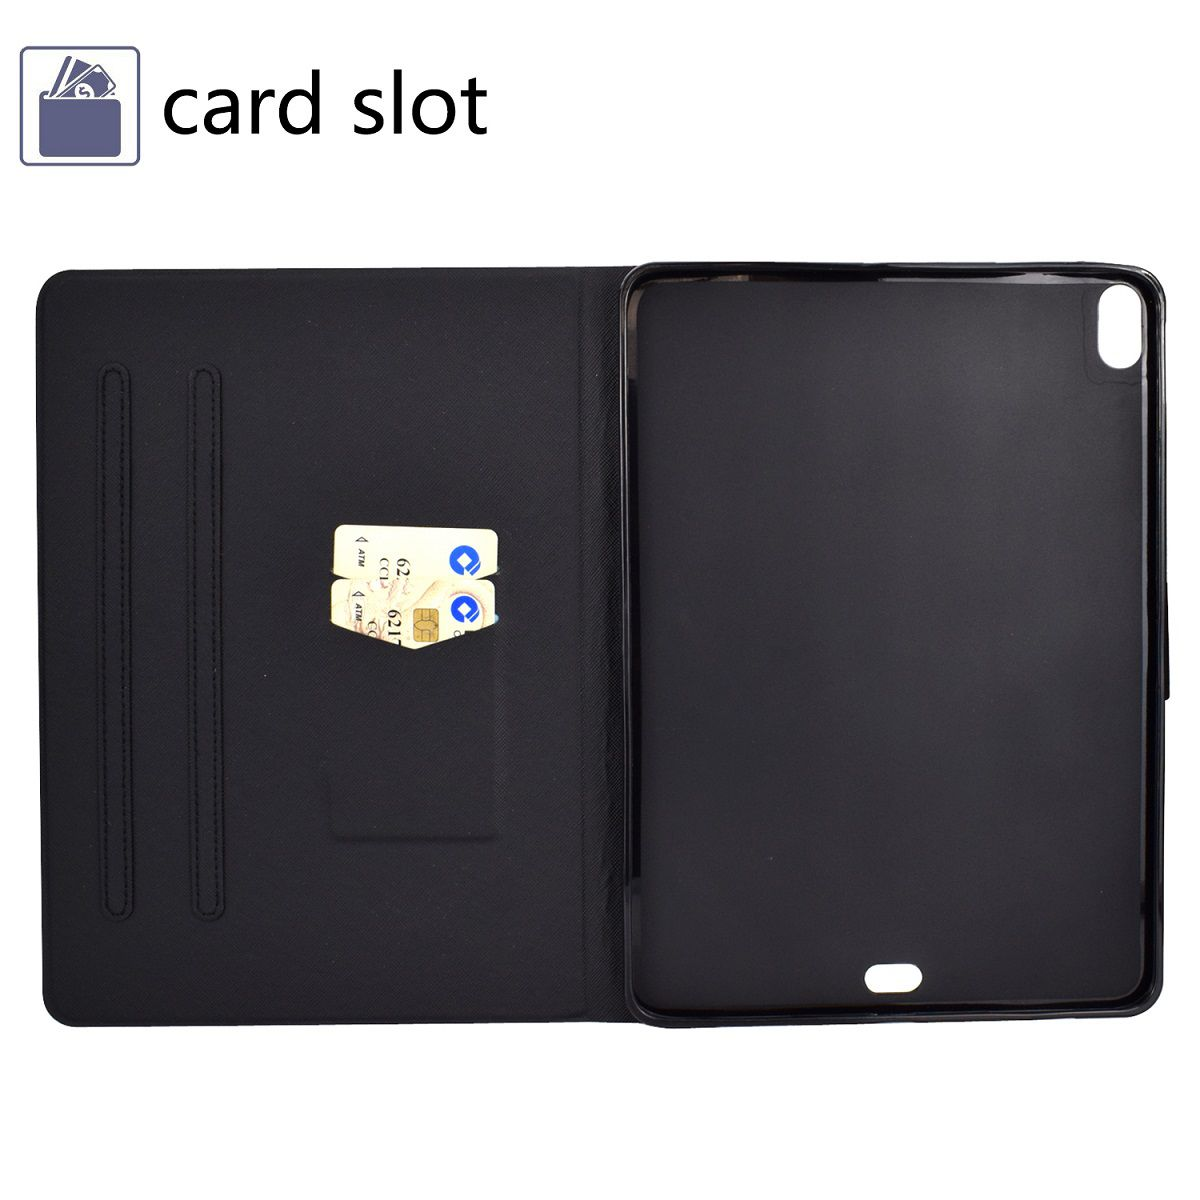 Capa Ipad 7 Tela 10.2 Ano 2019 A2197 A2198 A2199 Executiva Magnética Preta